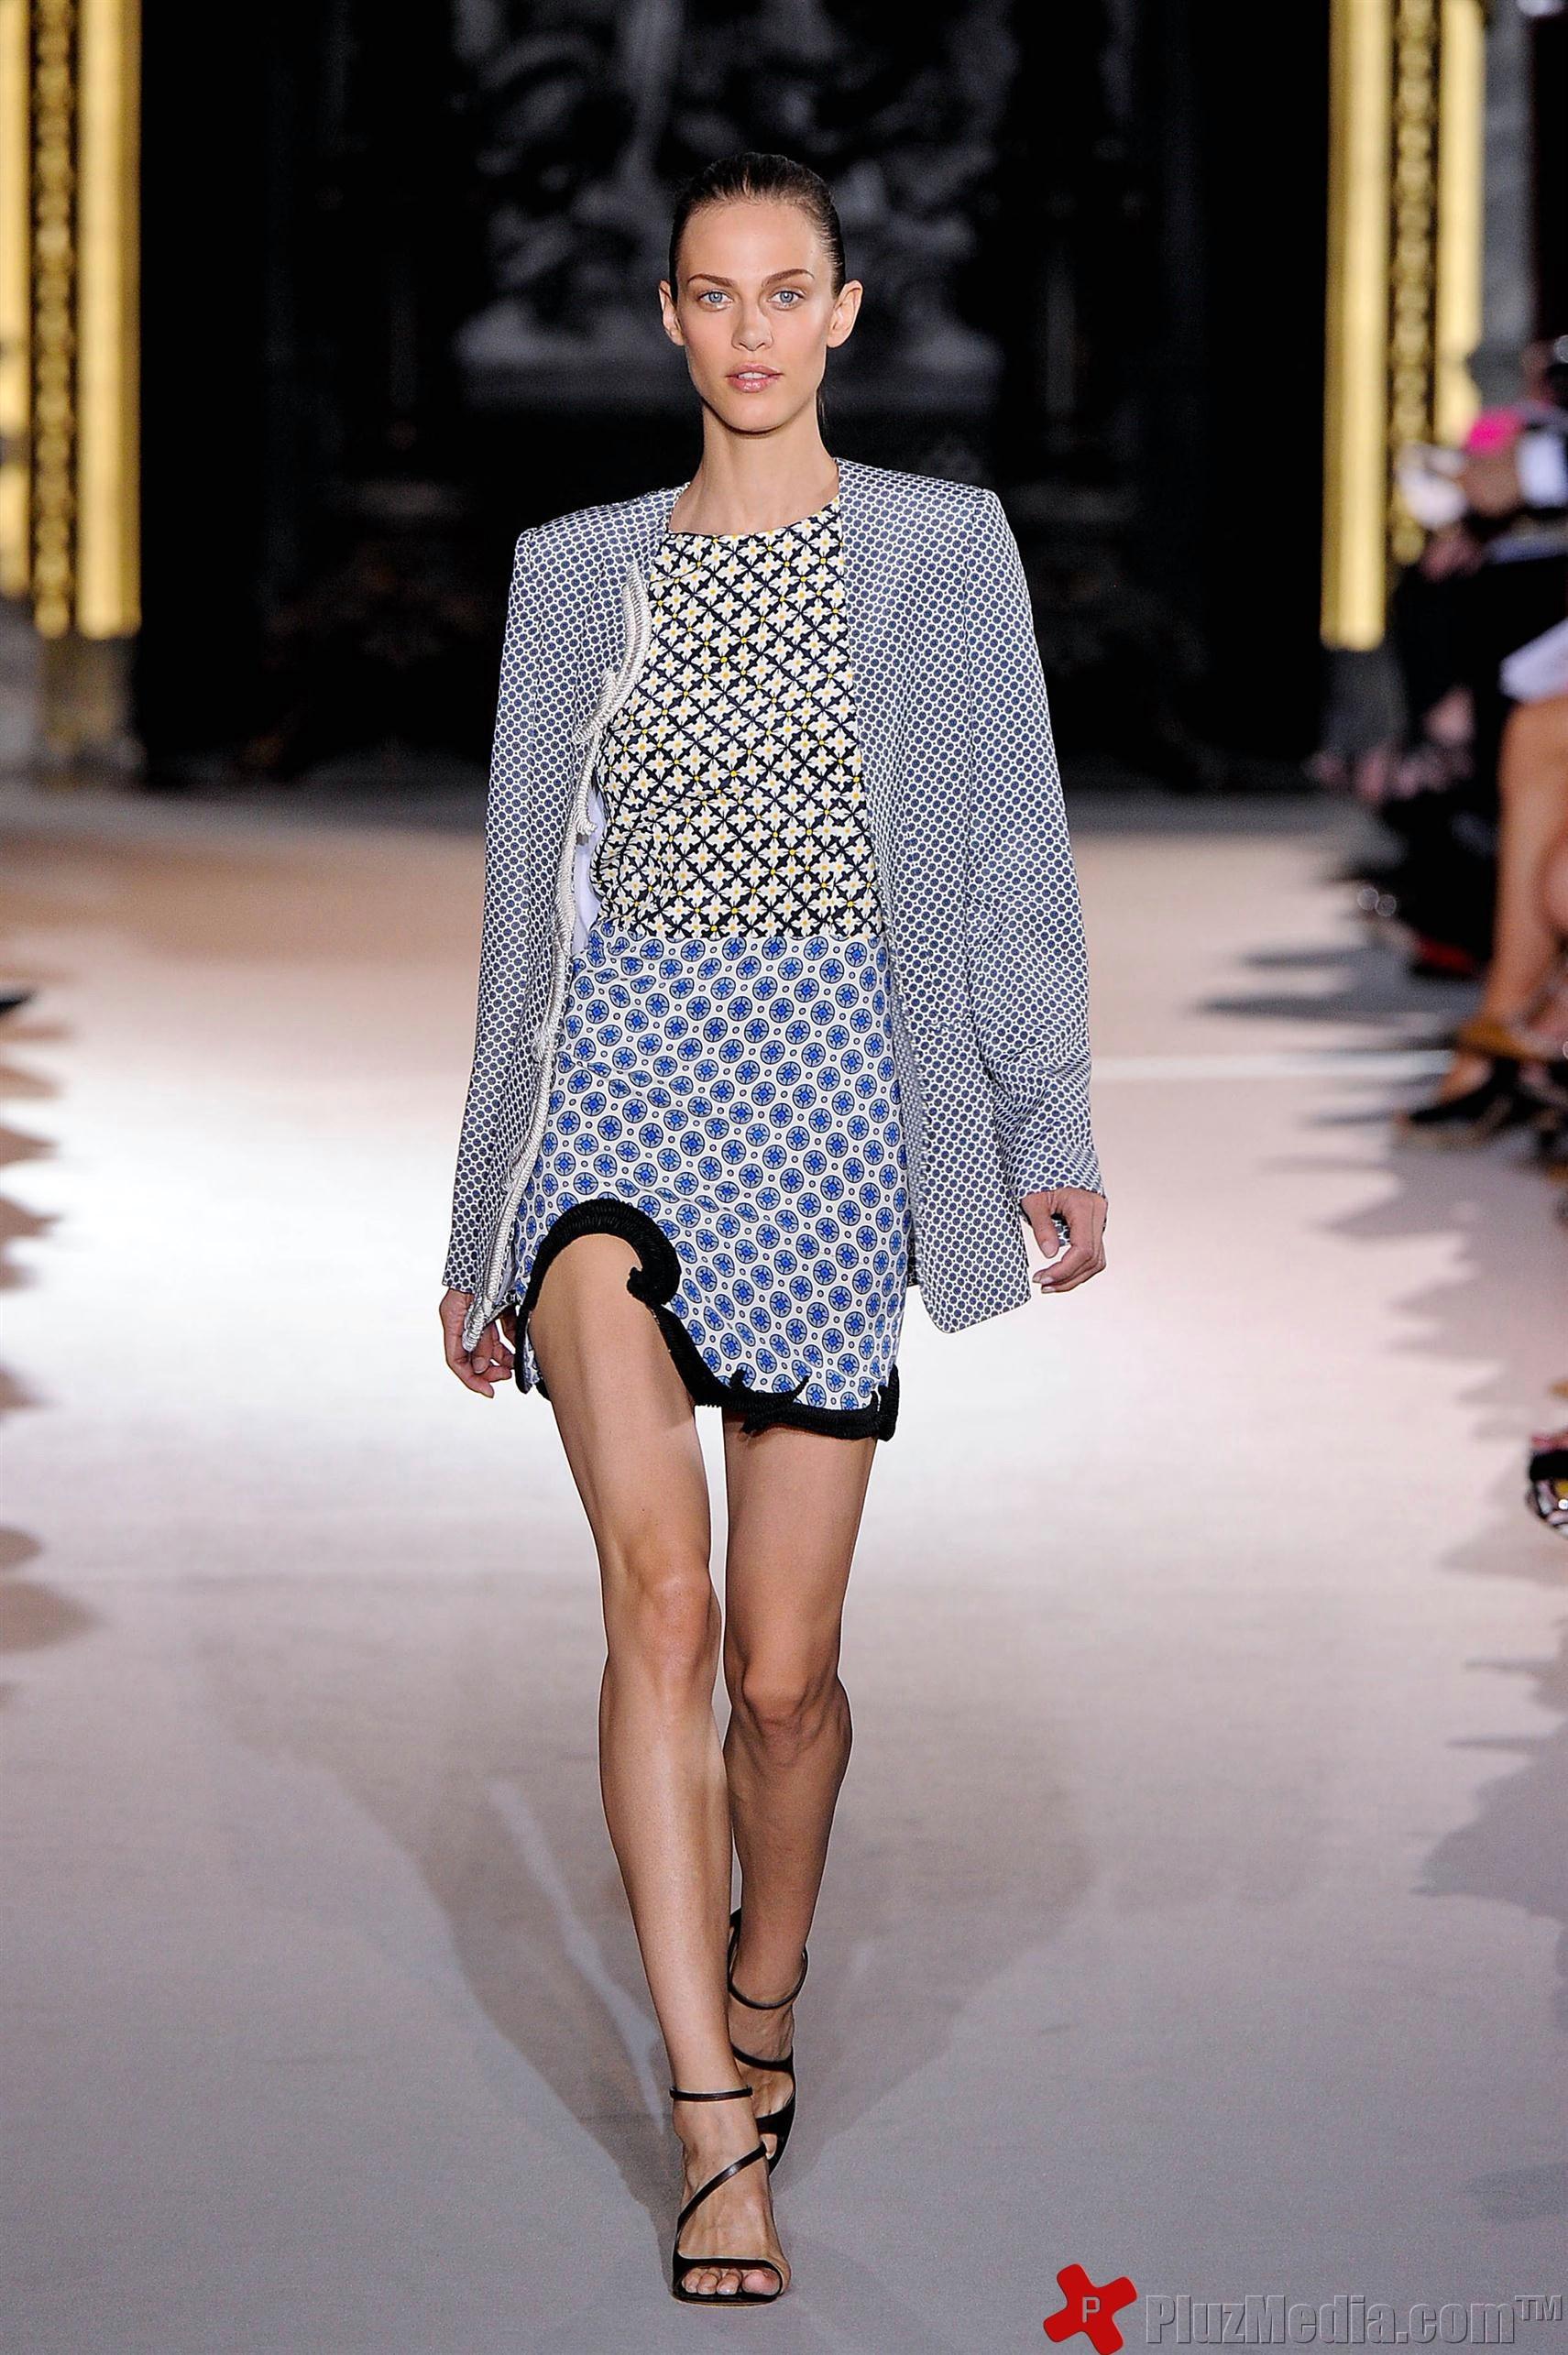 Paris Fashion Week Spring Summer 2012 Ready To Wear Stella Mccartney Catwalk